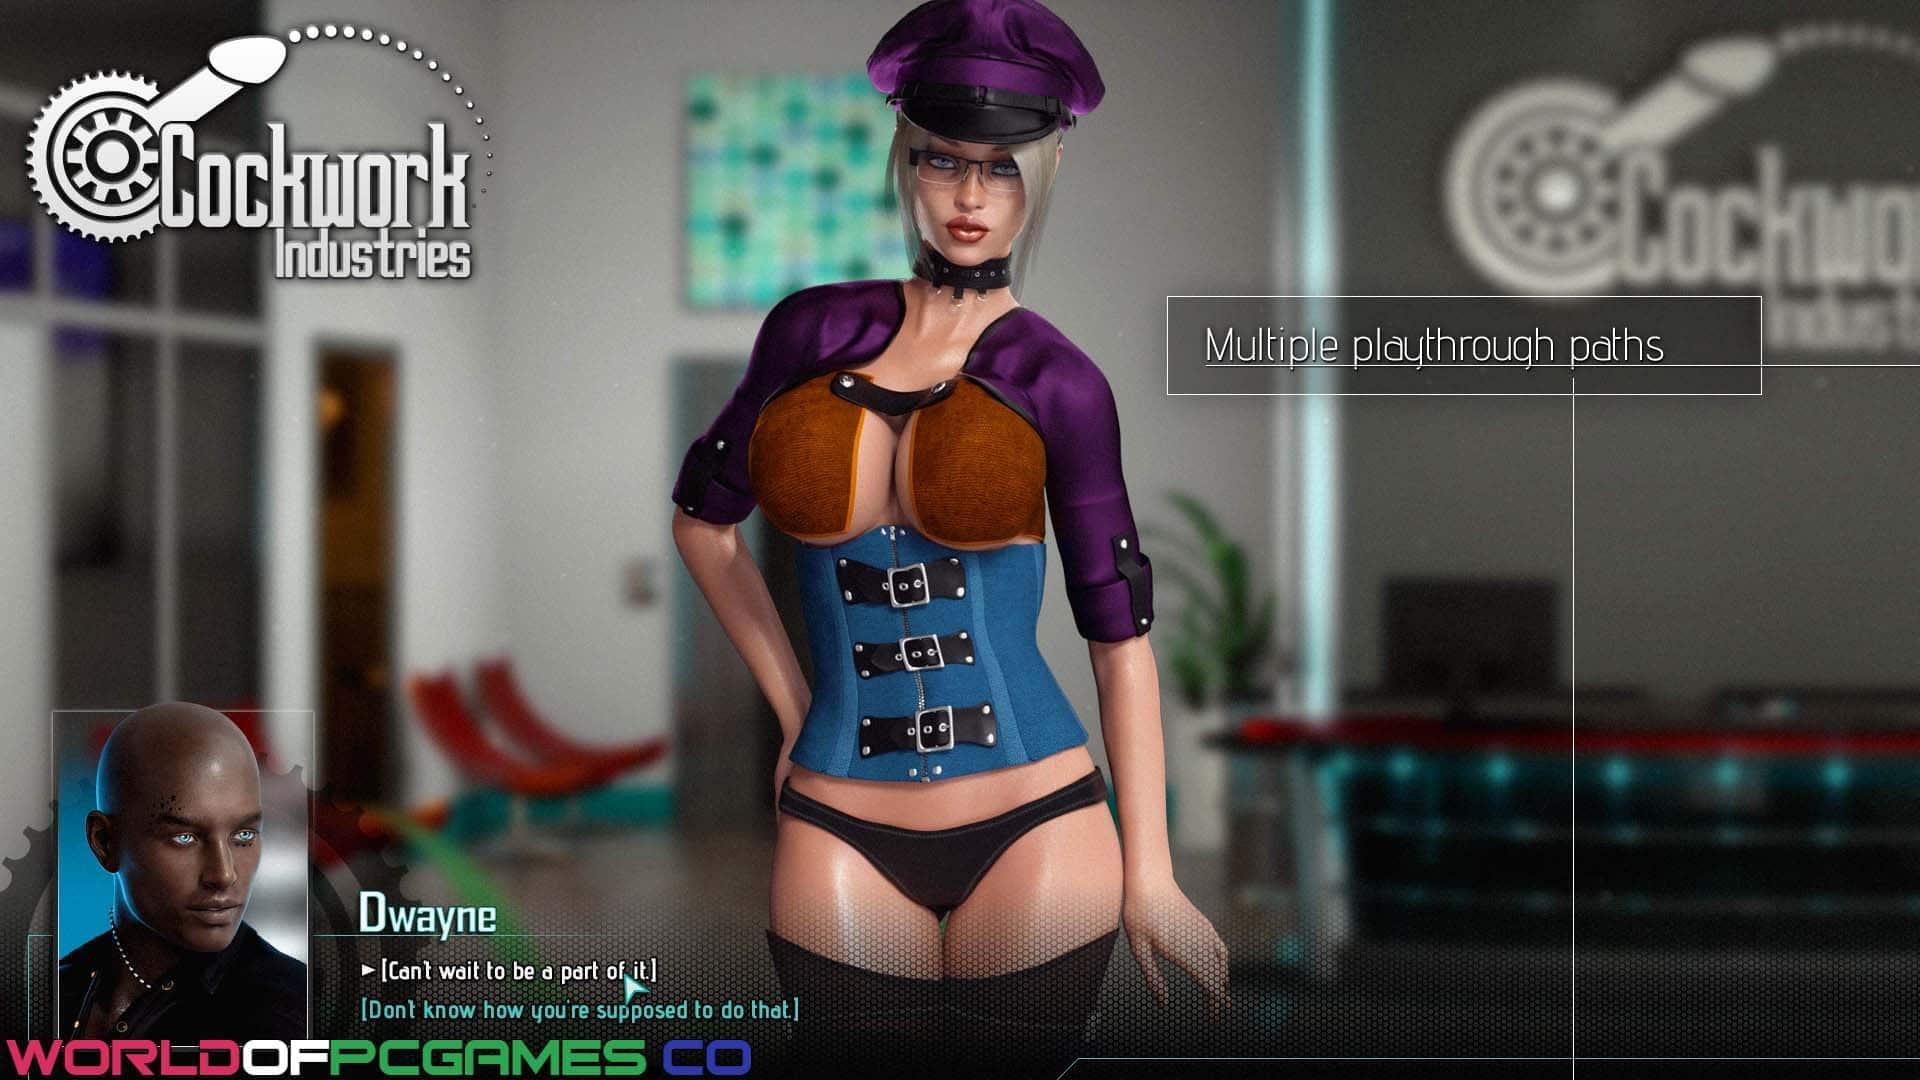 Cockwork Industries Complete Descarga gratuita Por Worldofpcgames1